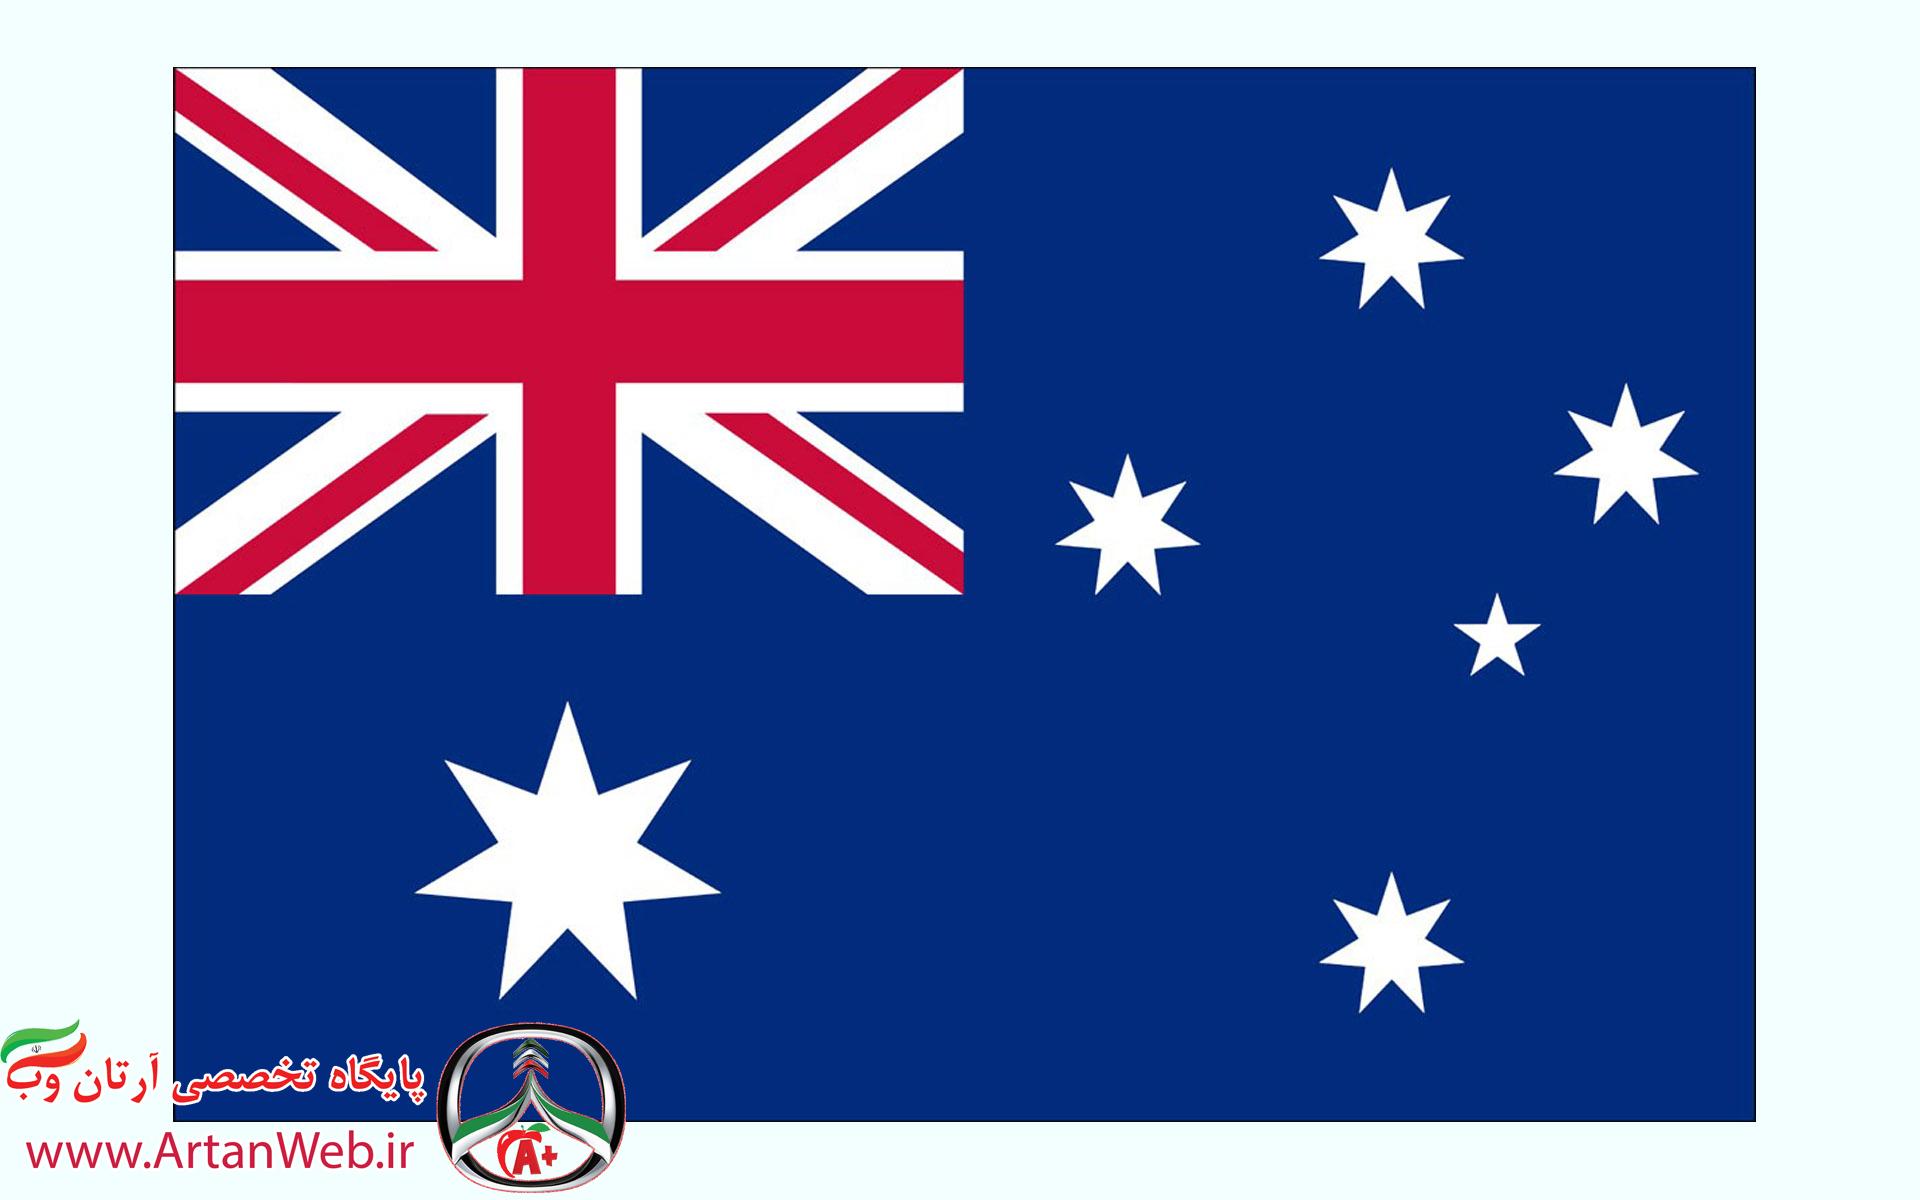 http://up.artanweb.ir/view/2144977/Artanweb.ir--Australia.png